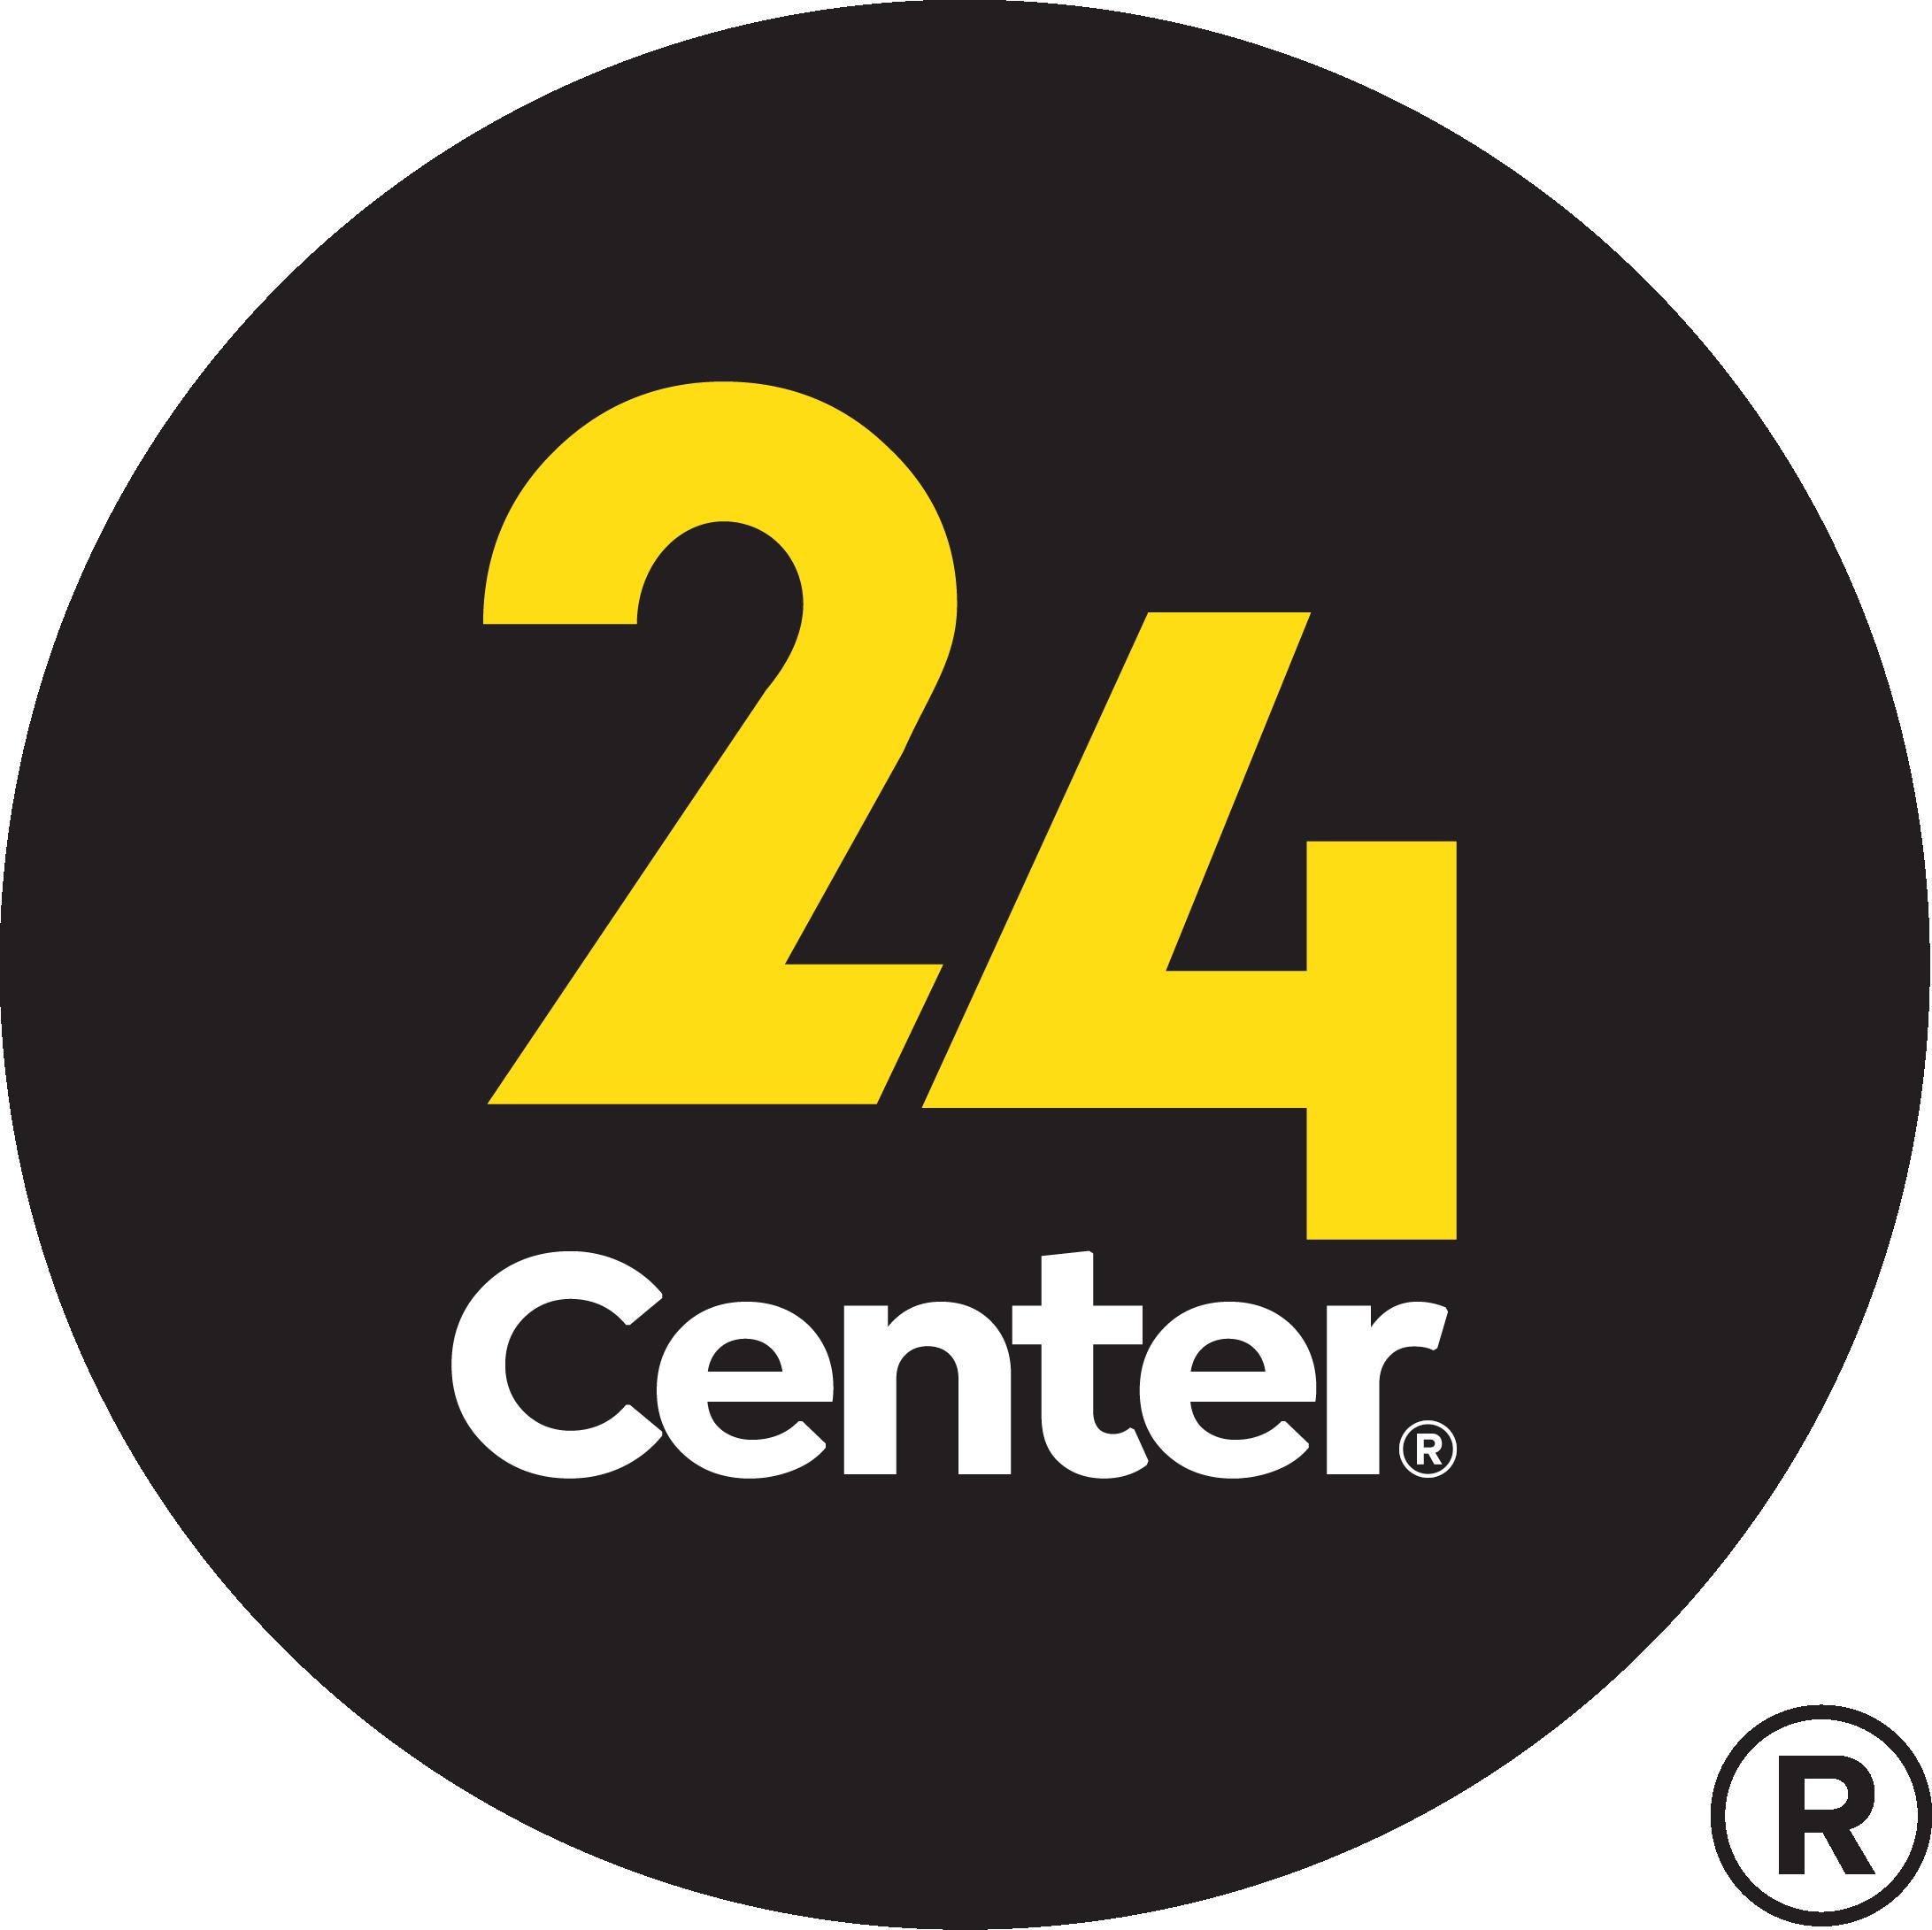 24 Center logo